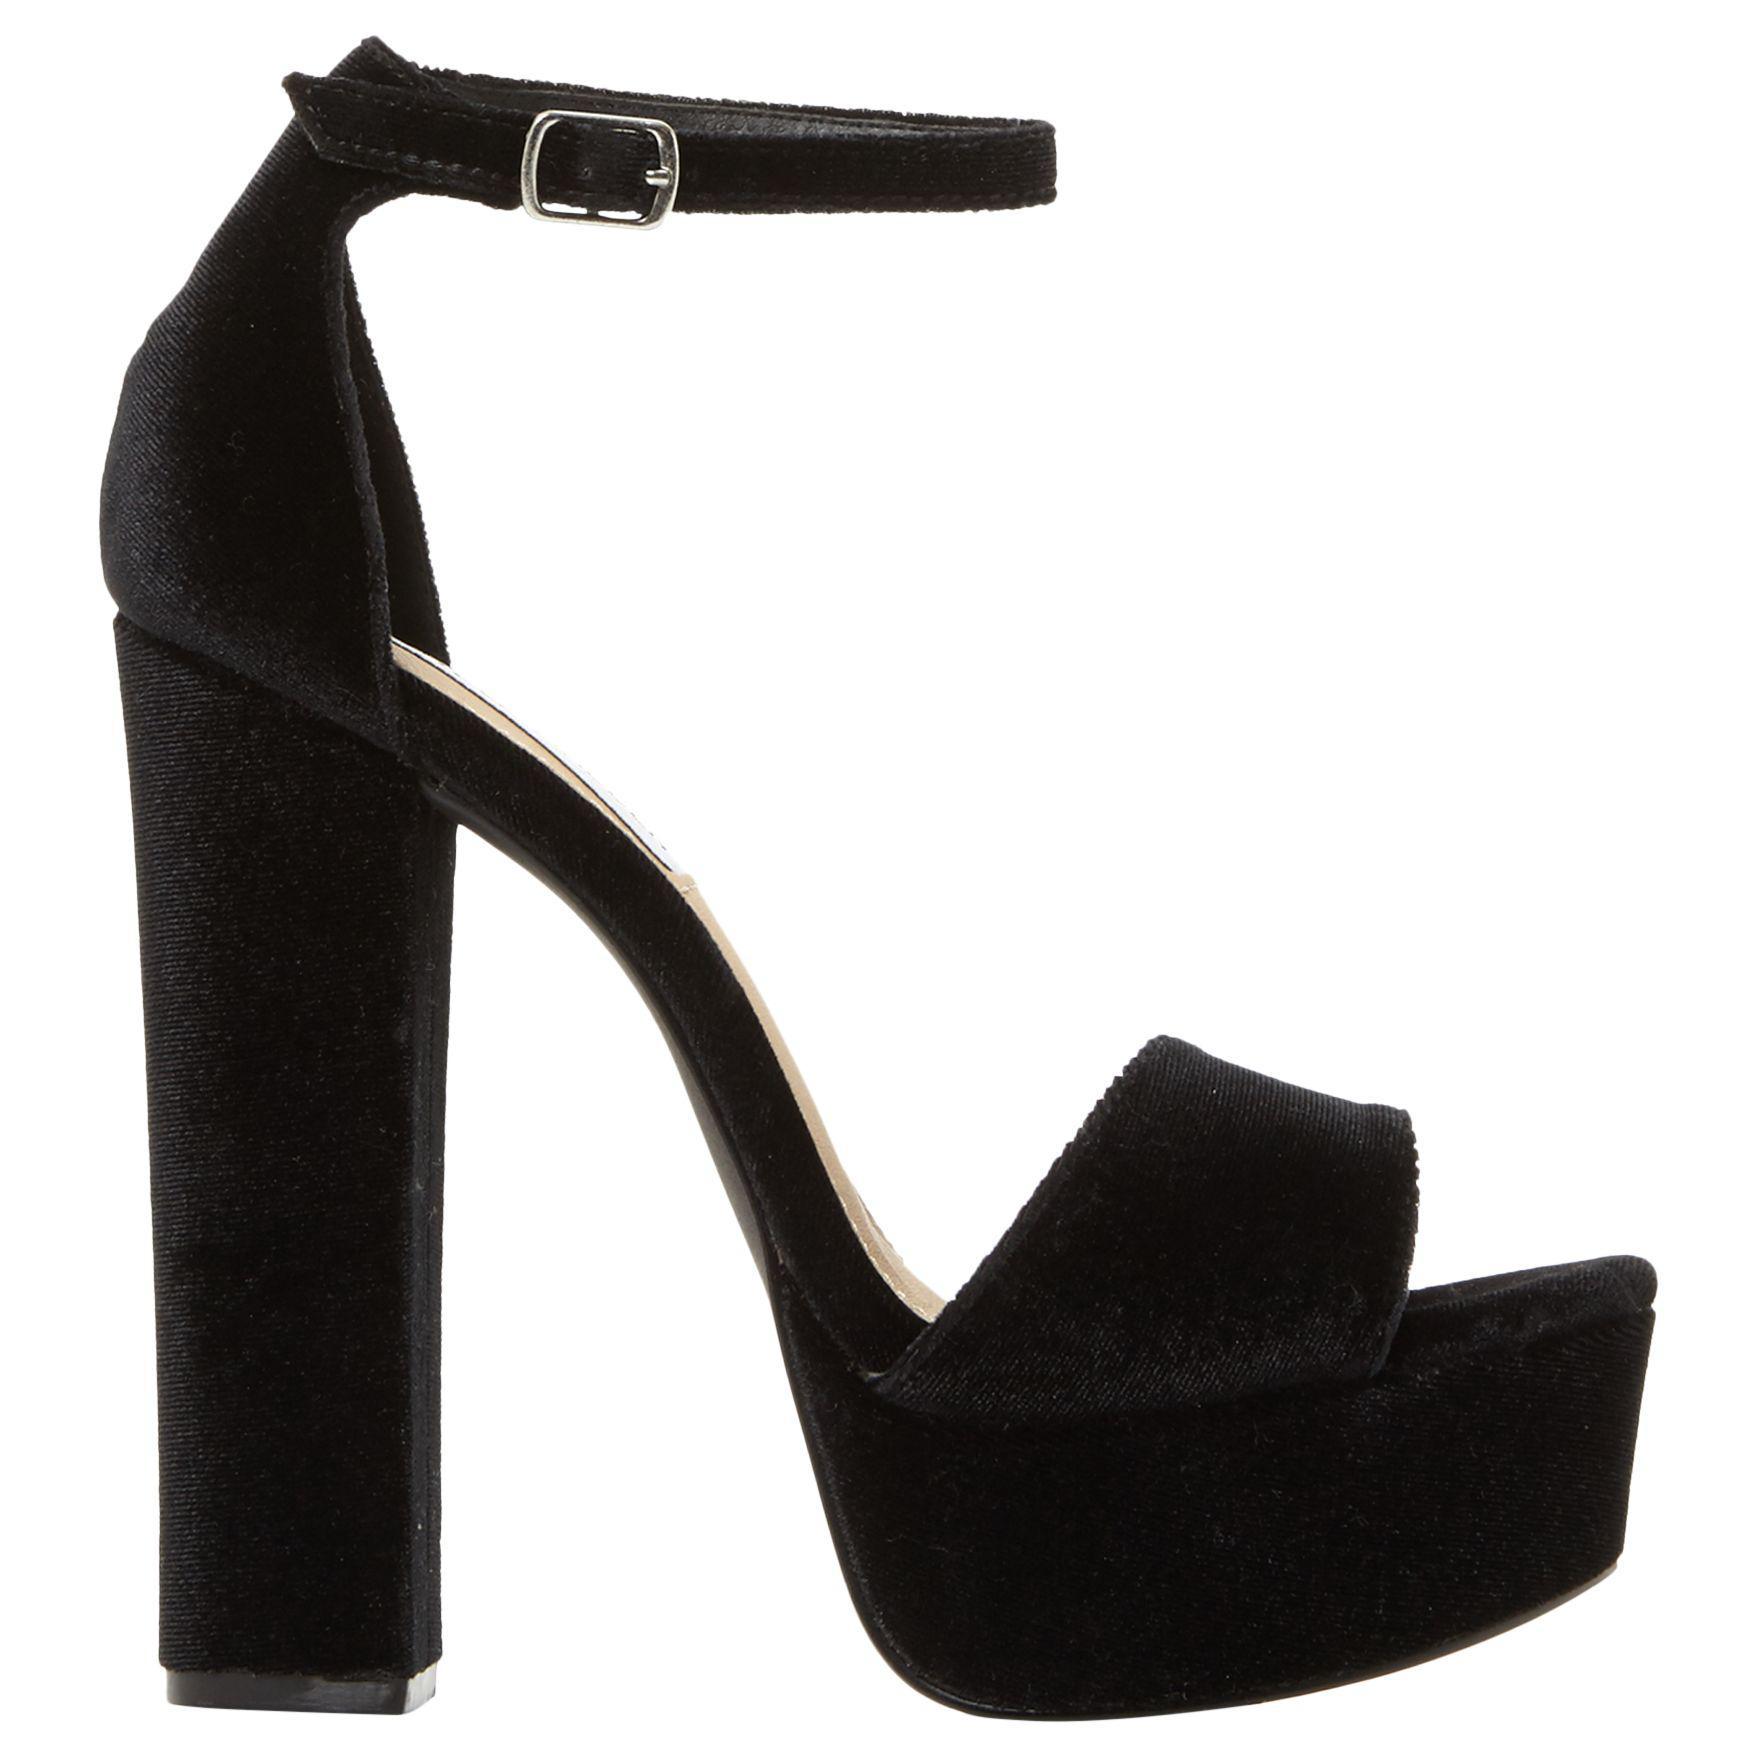 dad5f892ad1 Steve Madden Gonzo Platform Block Heeled Sandals in Black - Lyst